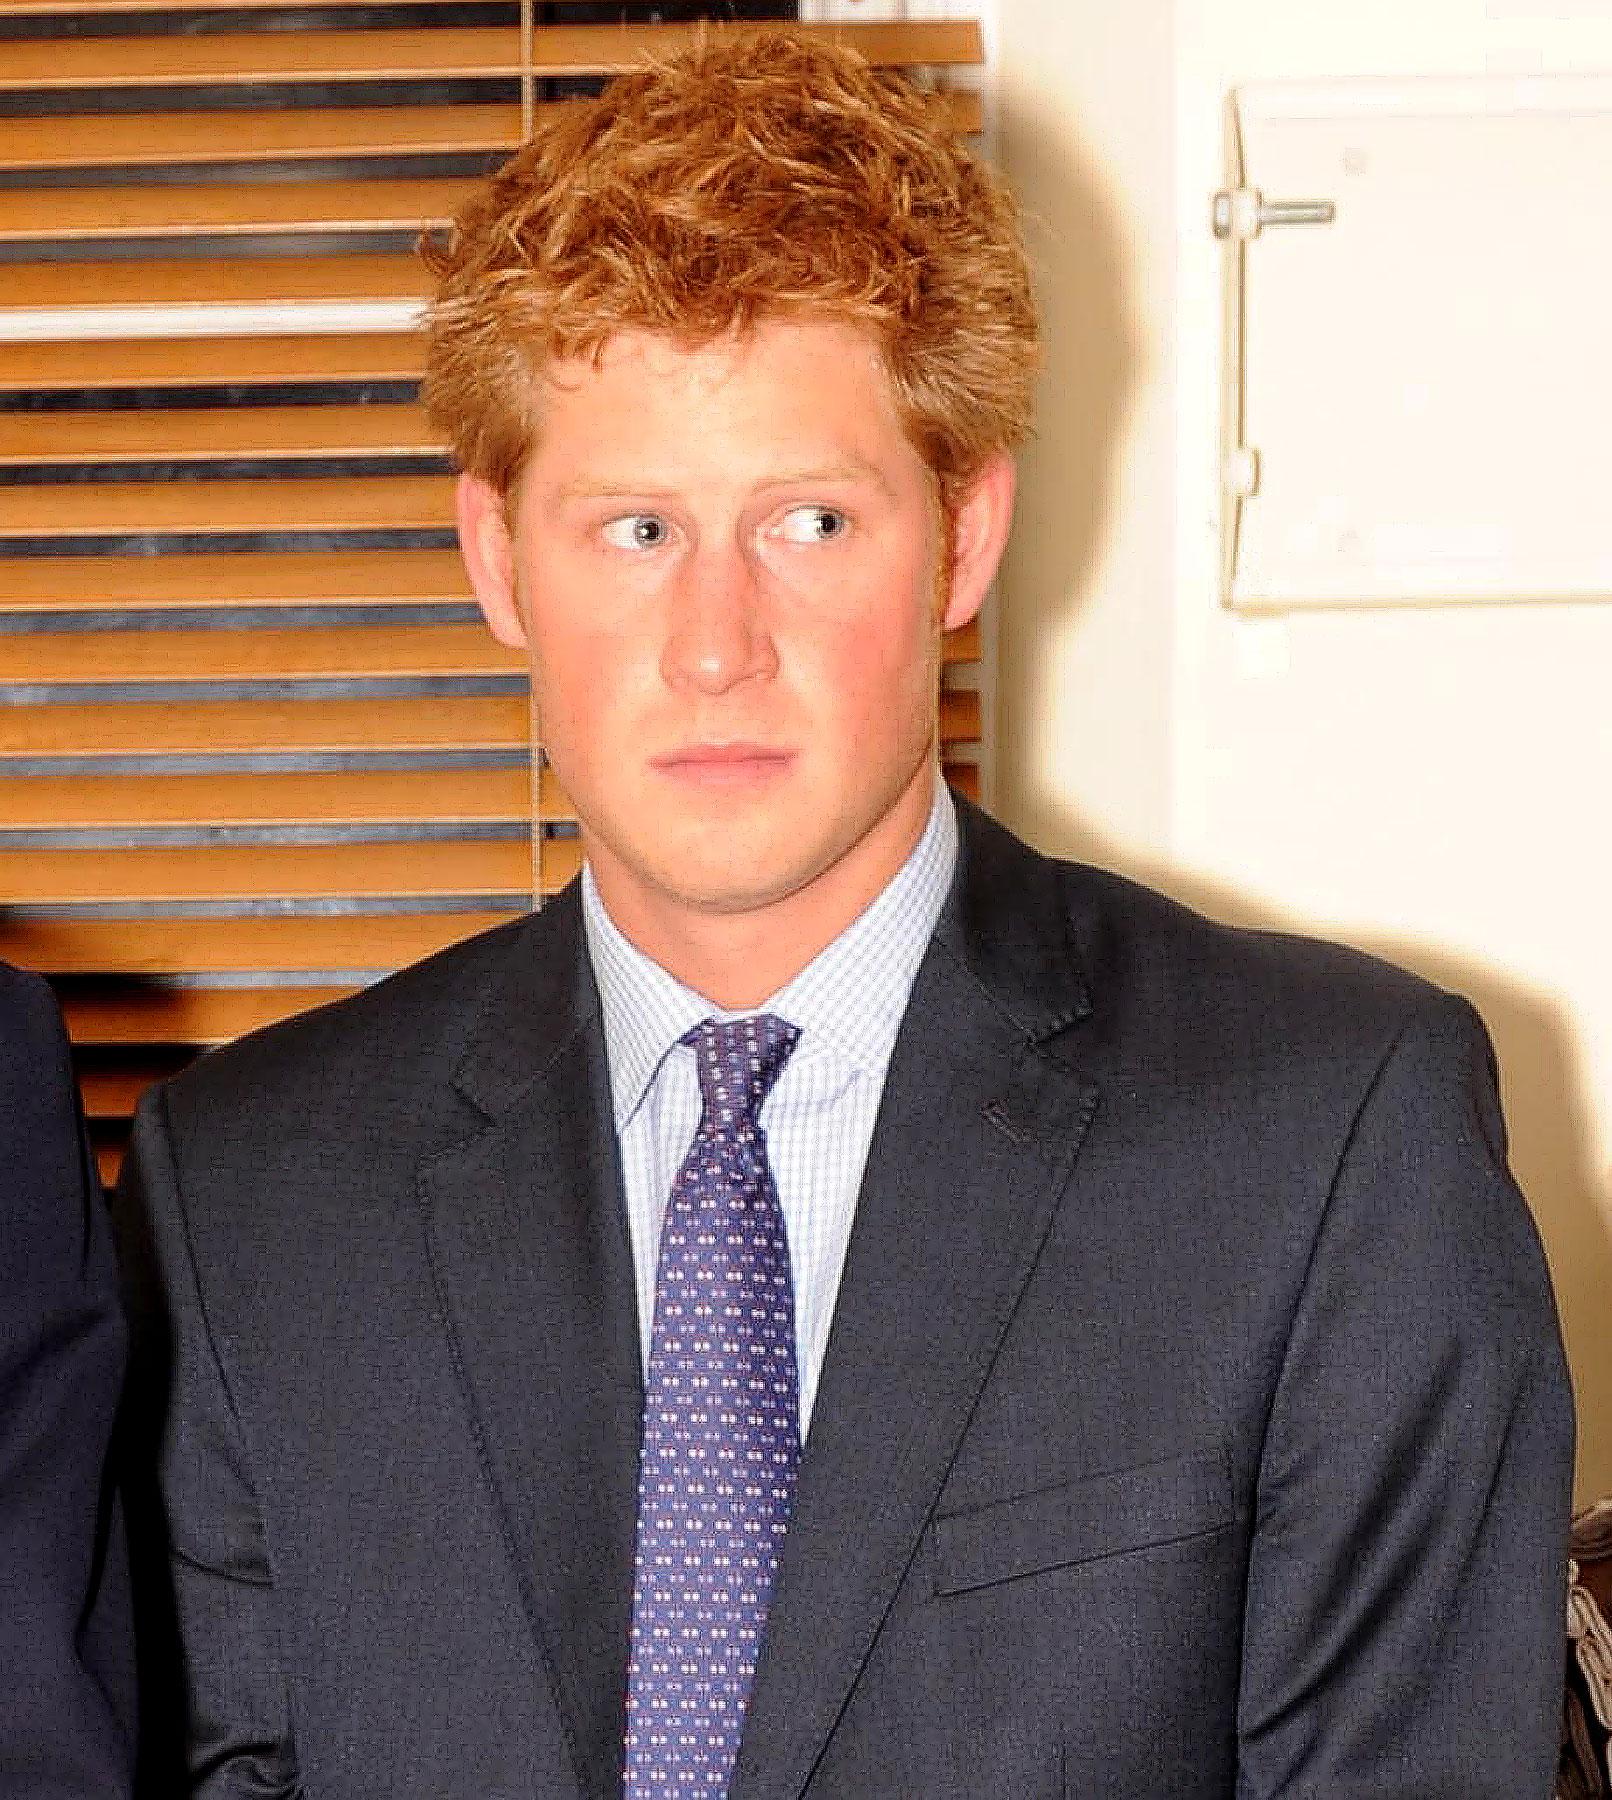 Prince Harry To Get Sensitive